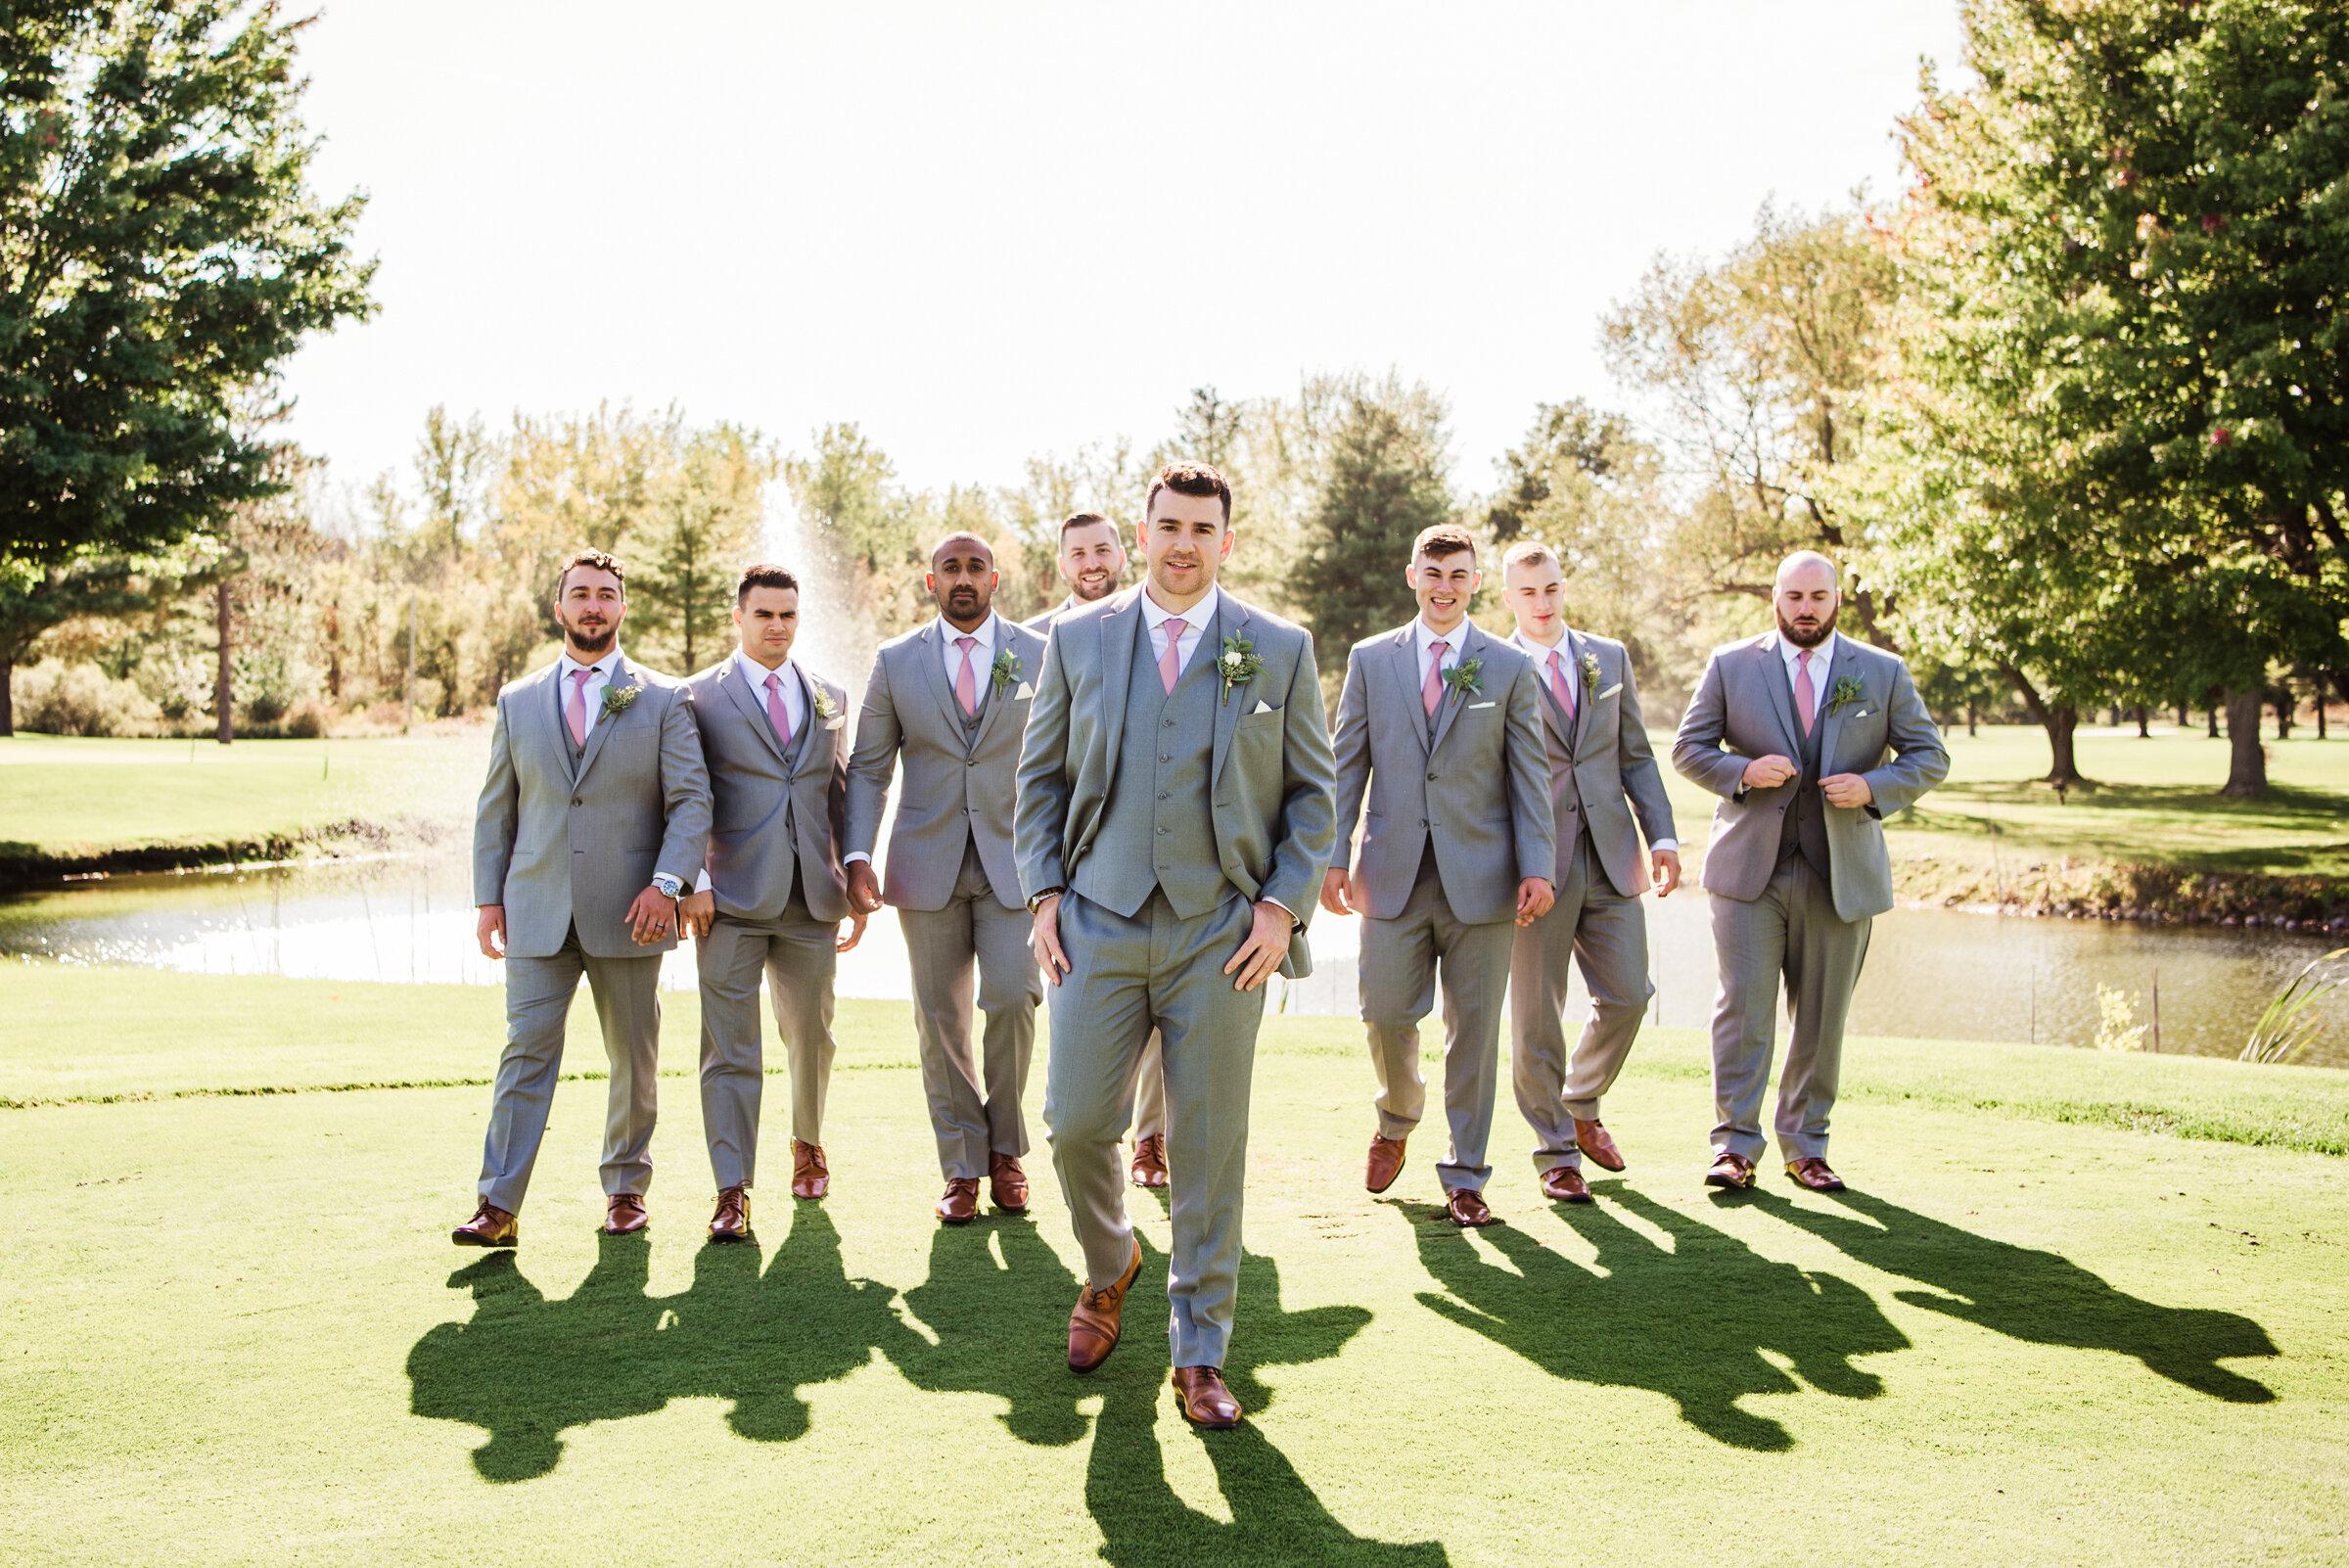 Deerfield_Country_Club_Rochester_Wedding_JILL_STUDIO_Rochester_NY_Photographer_DSC_6288.jpg